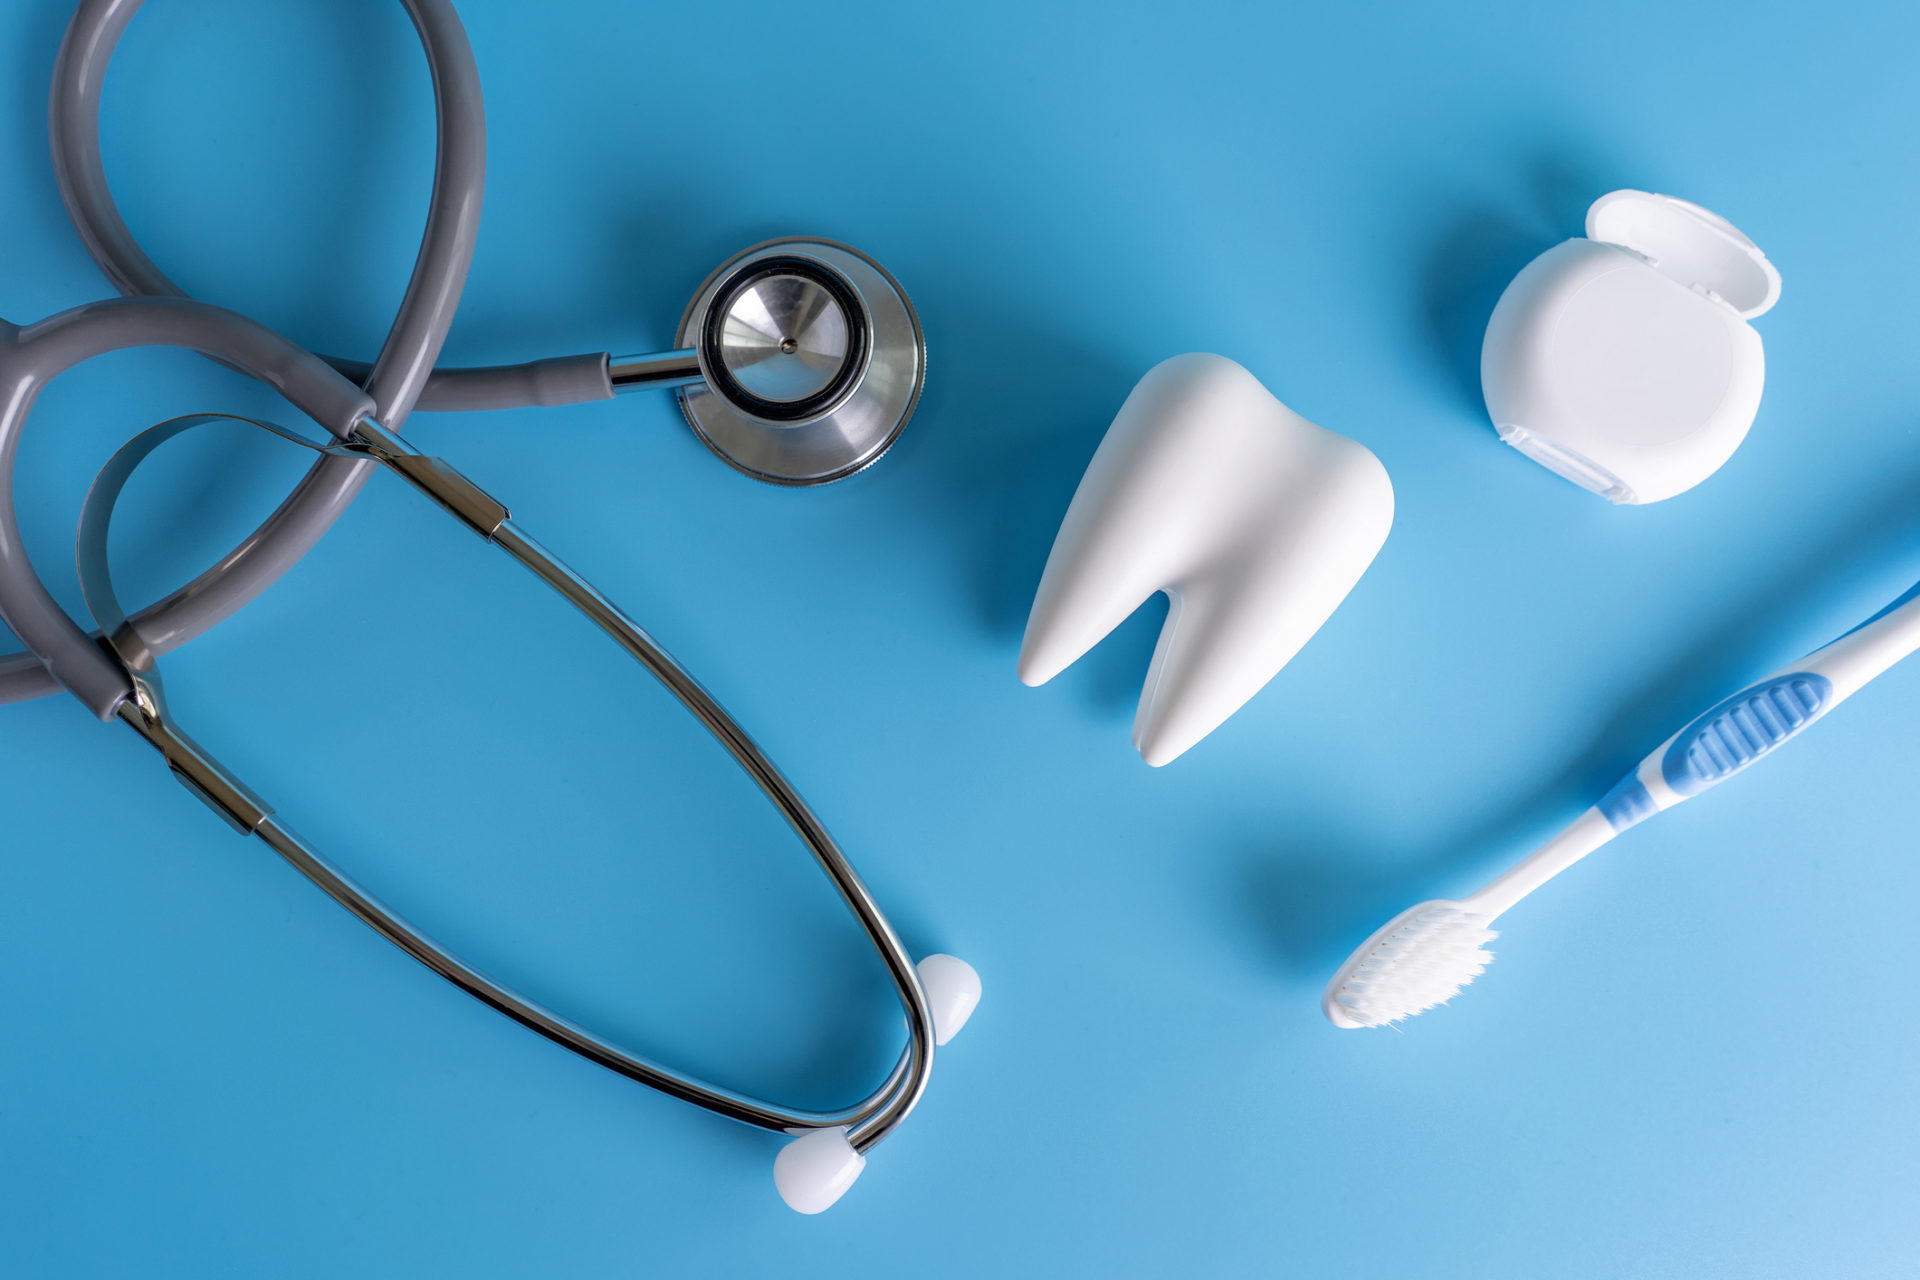 Close-Up Of Dental Equipment Over Blue Background